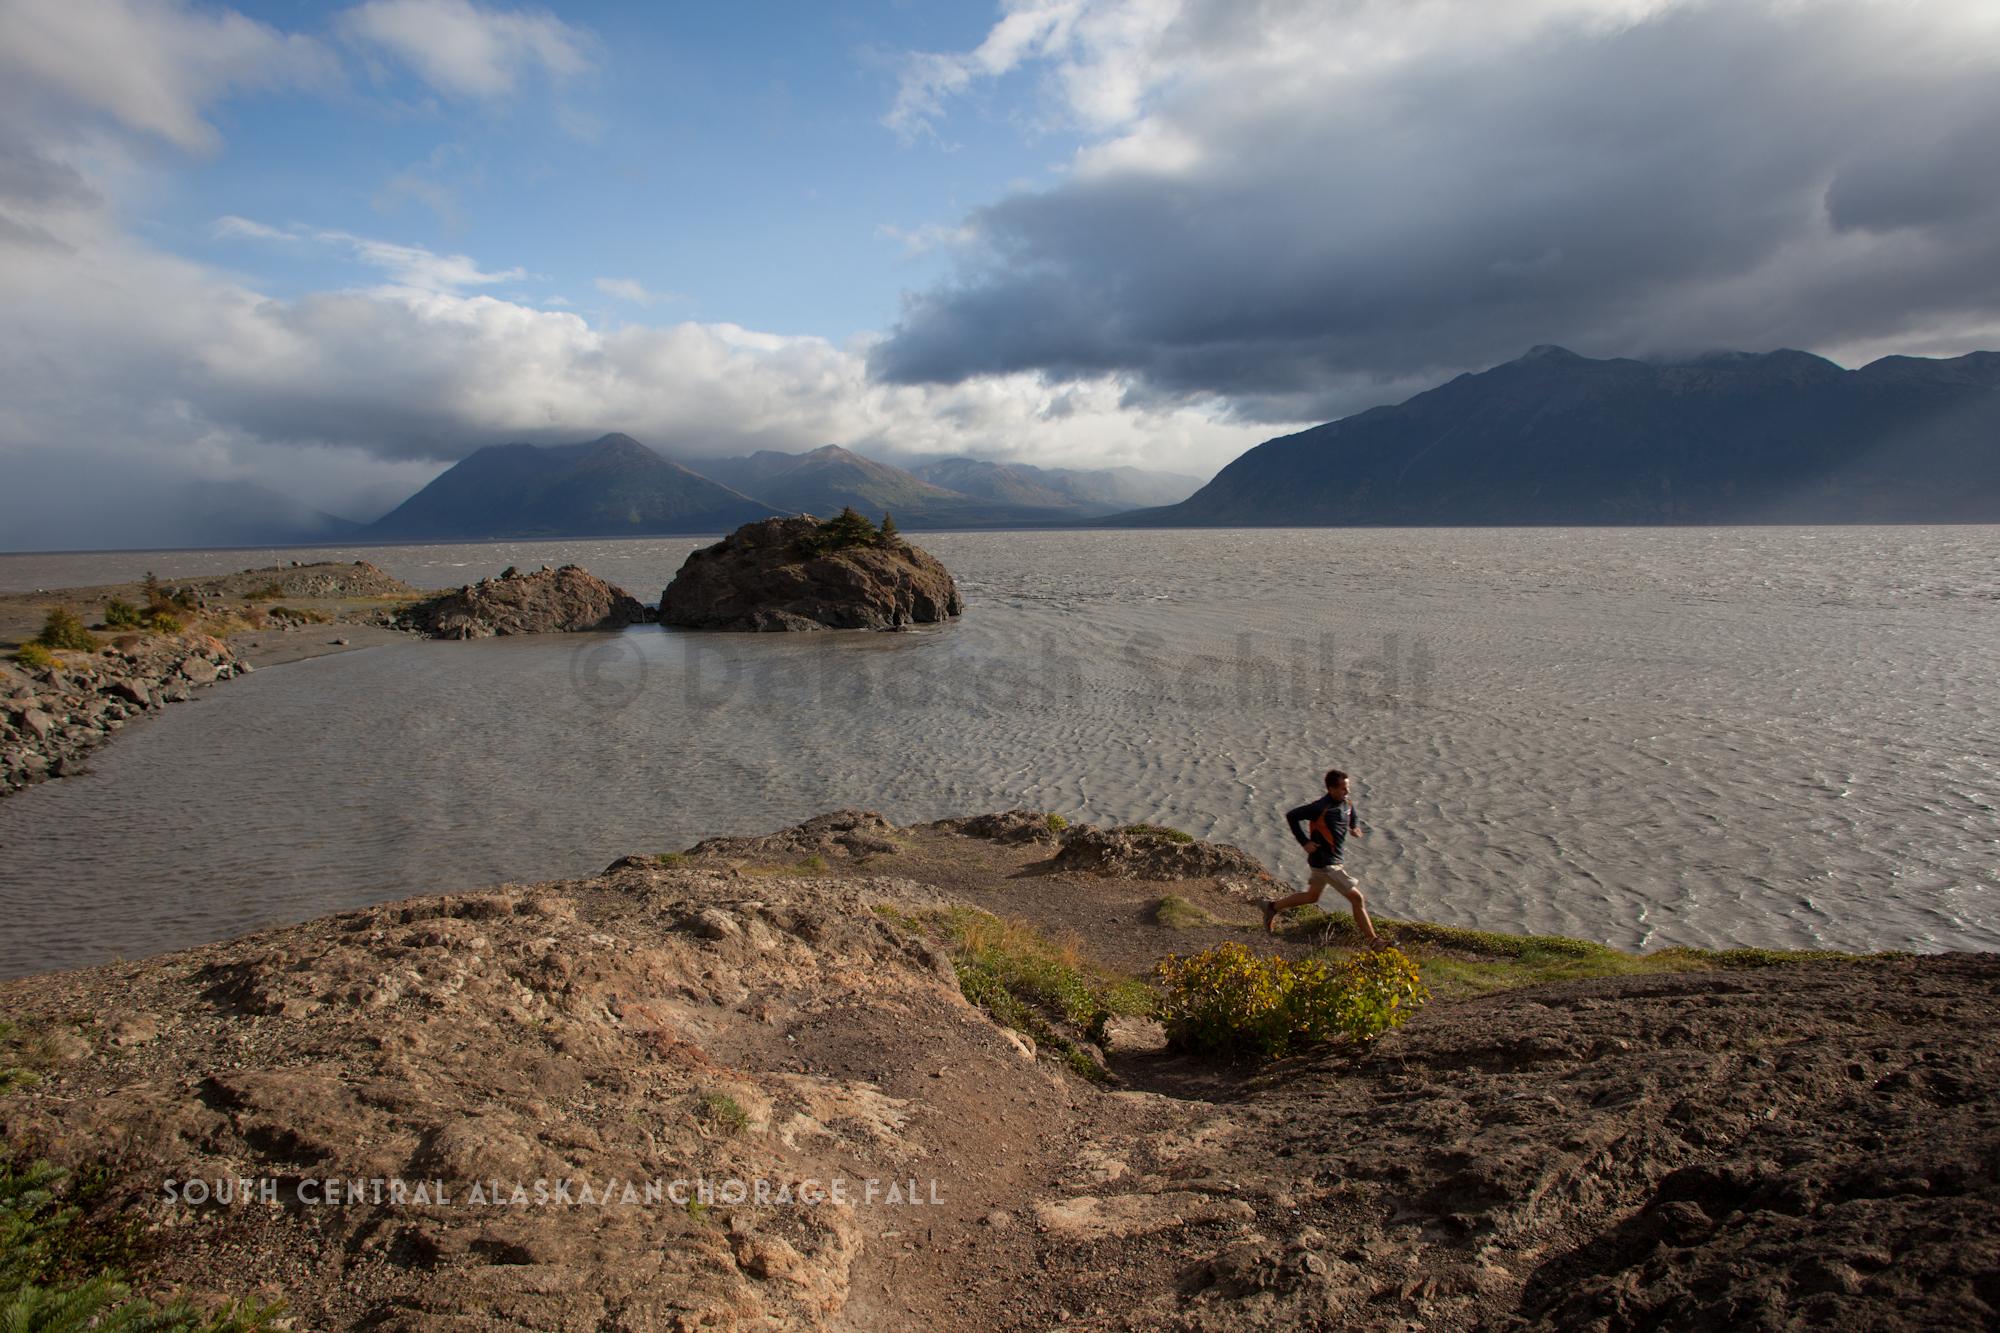 CT8. South Central Alaska-Beluga Pt._ fall.jpg